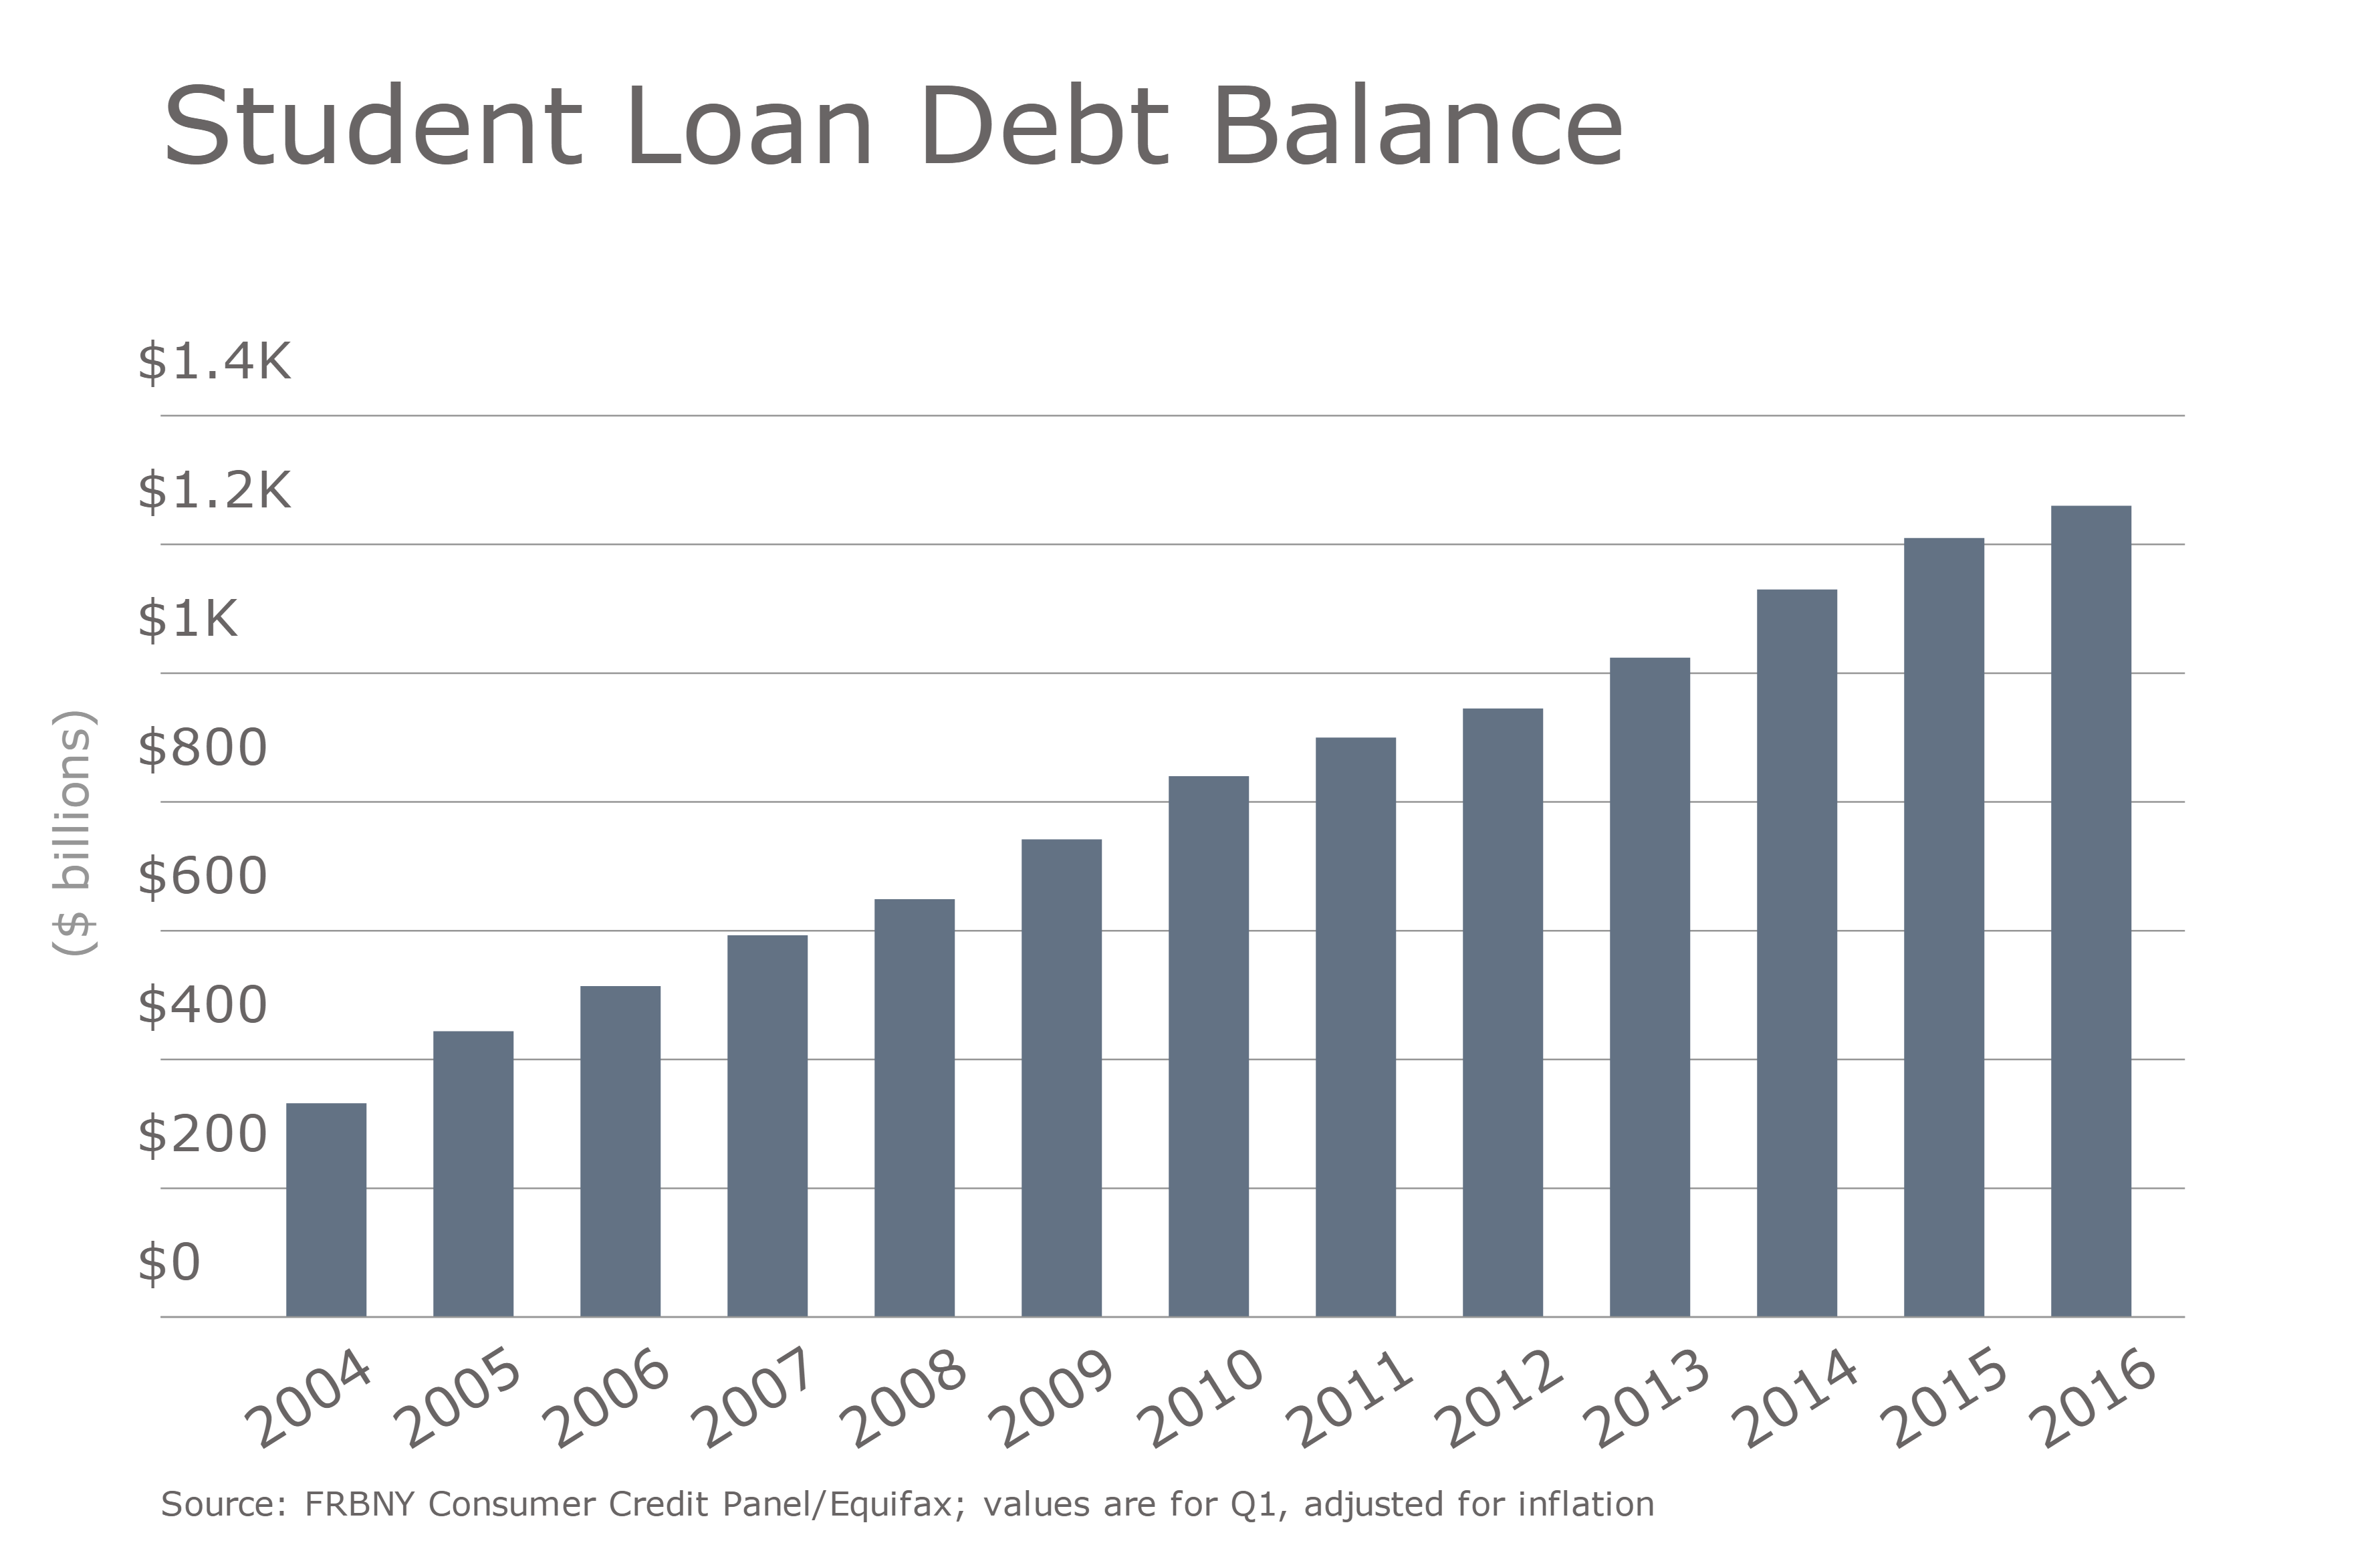 https://assets.sourcemedia.com/29/42/f62bb7b54b548f812a4800ea2f59/student-loan-debt-balance-2.png